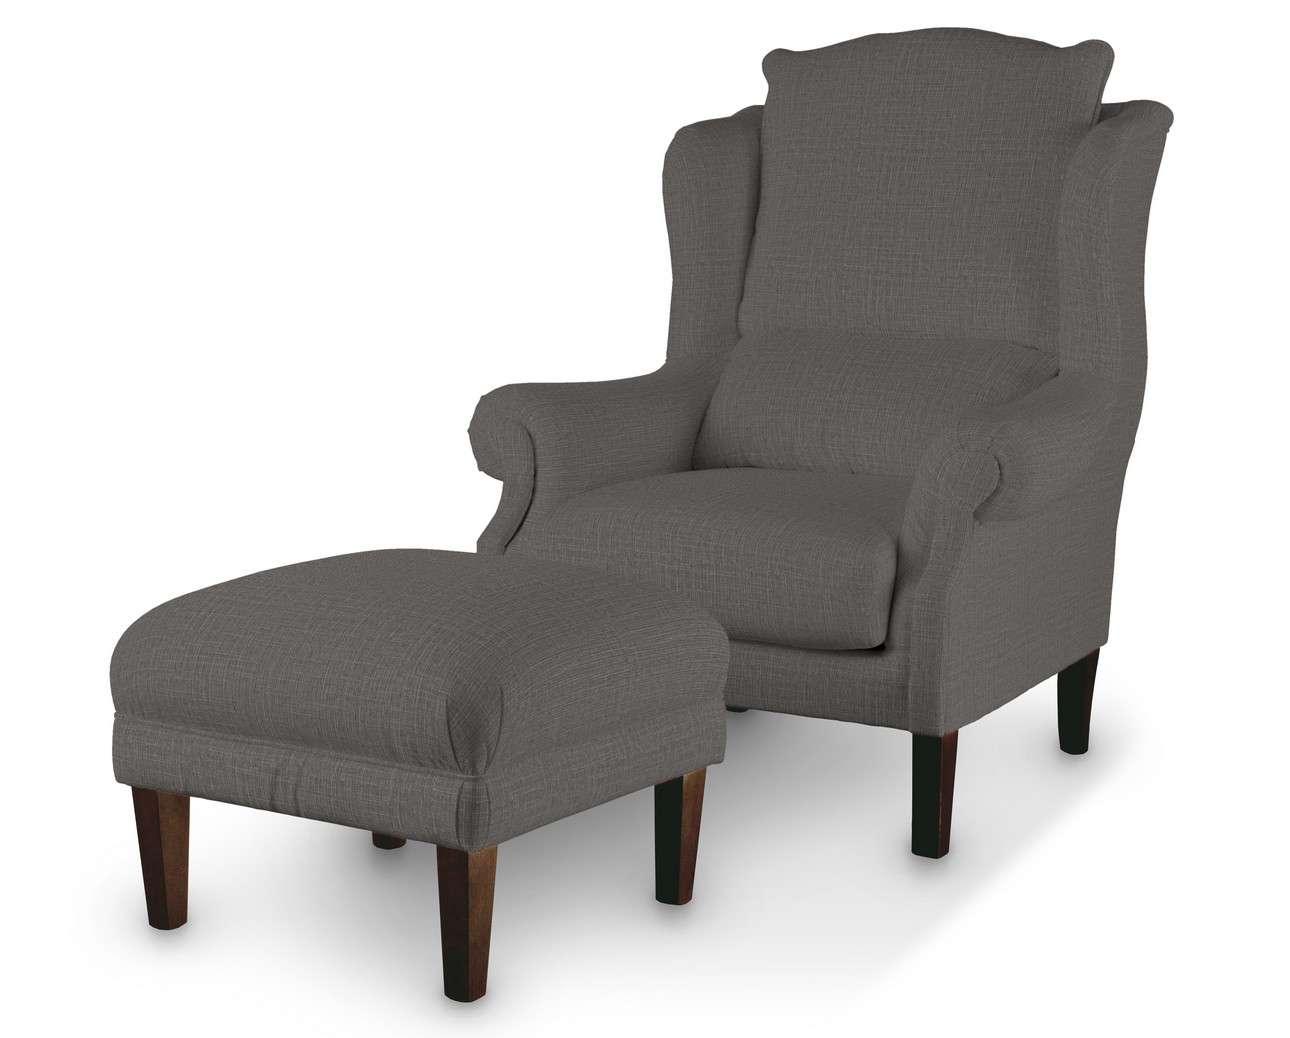 Podnóżek do fotela w kolekcji Living, tkanina: 161-16